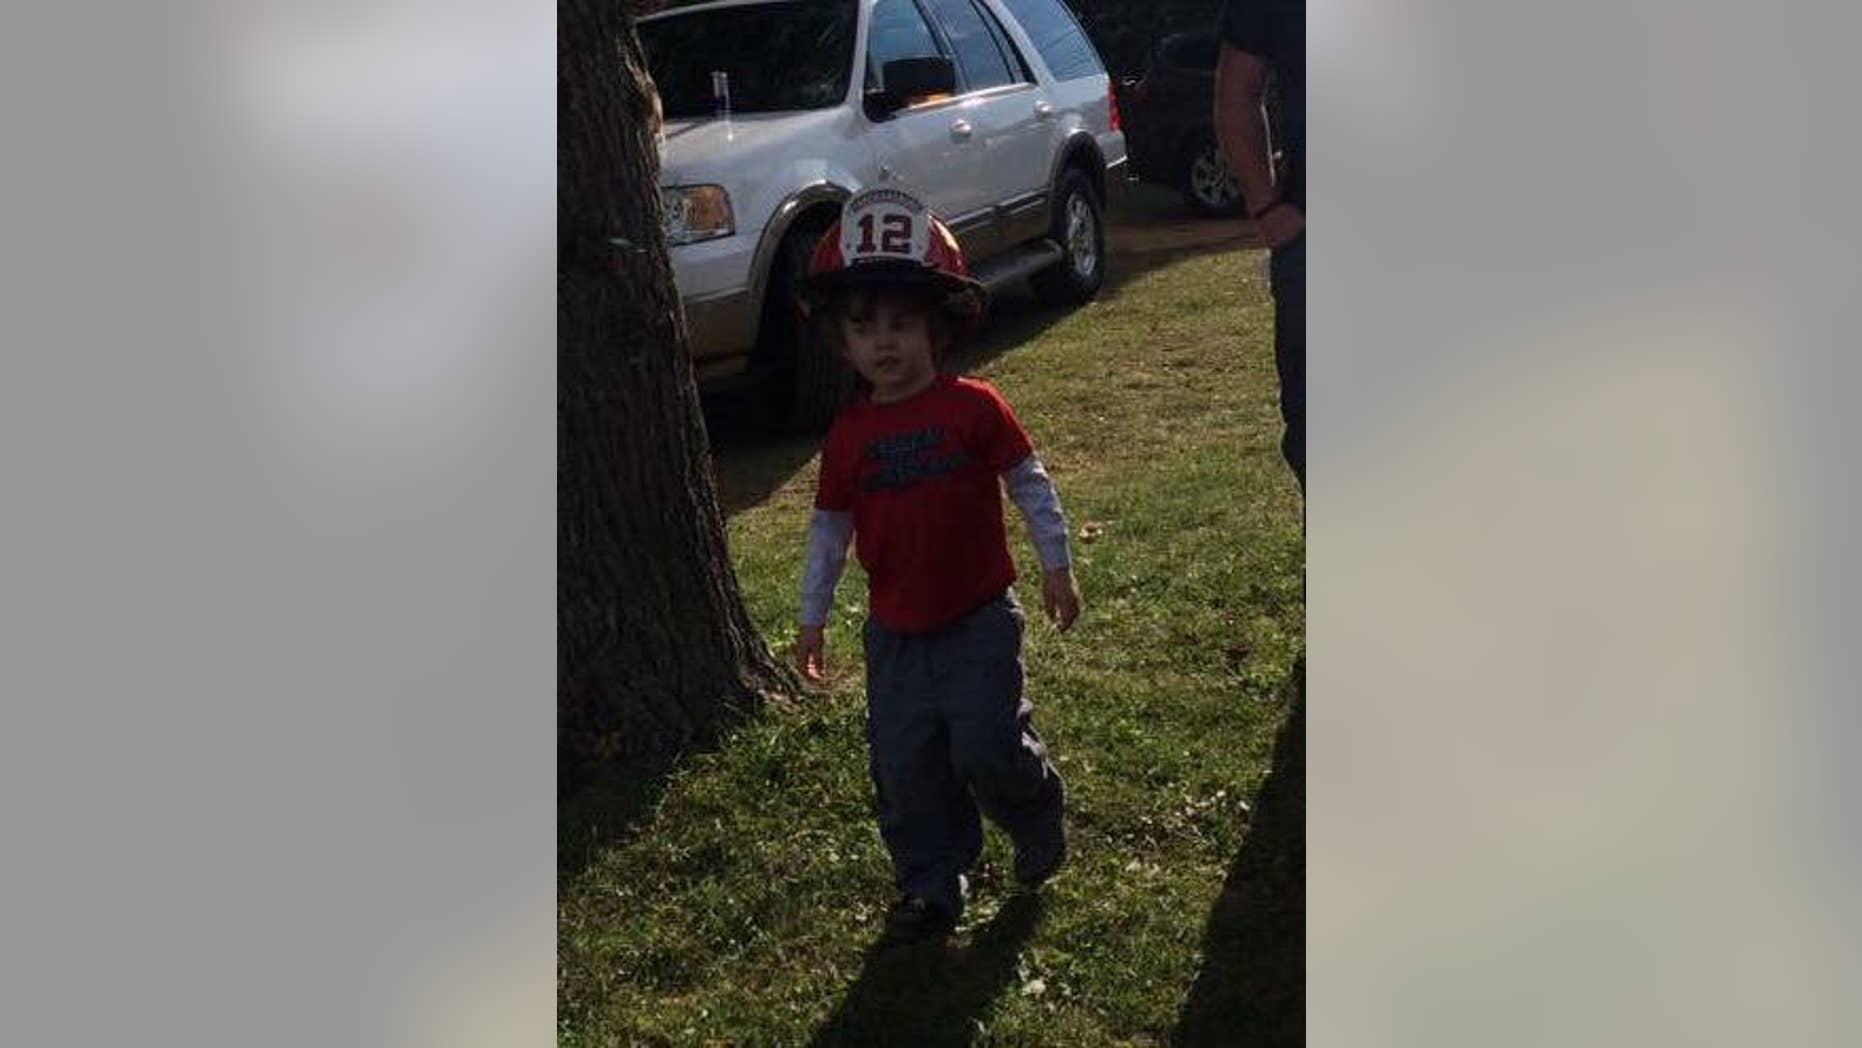 Bentley Koch was identified as the boy who died.